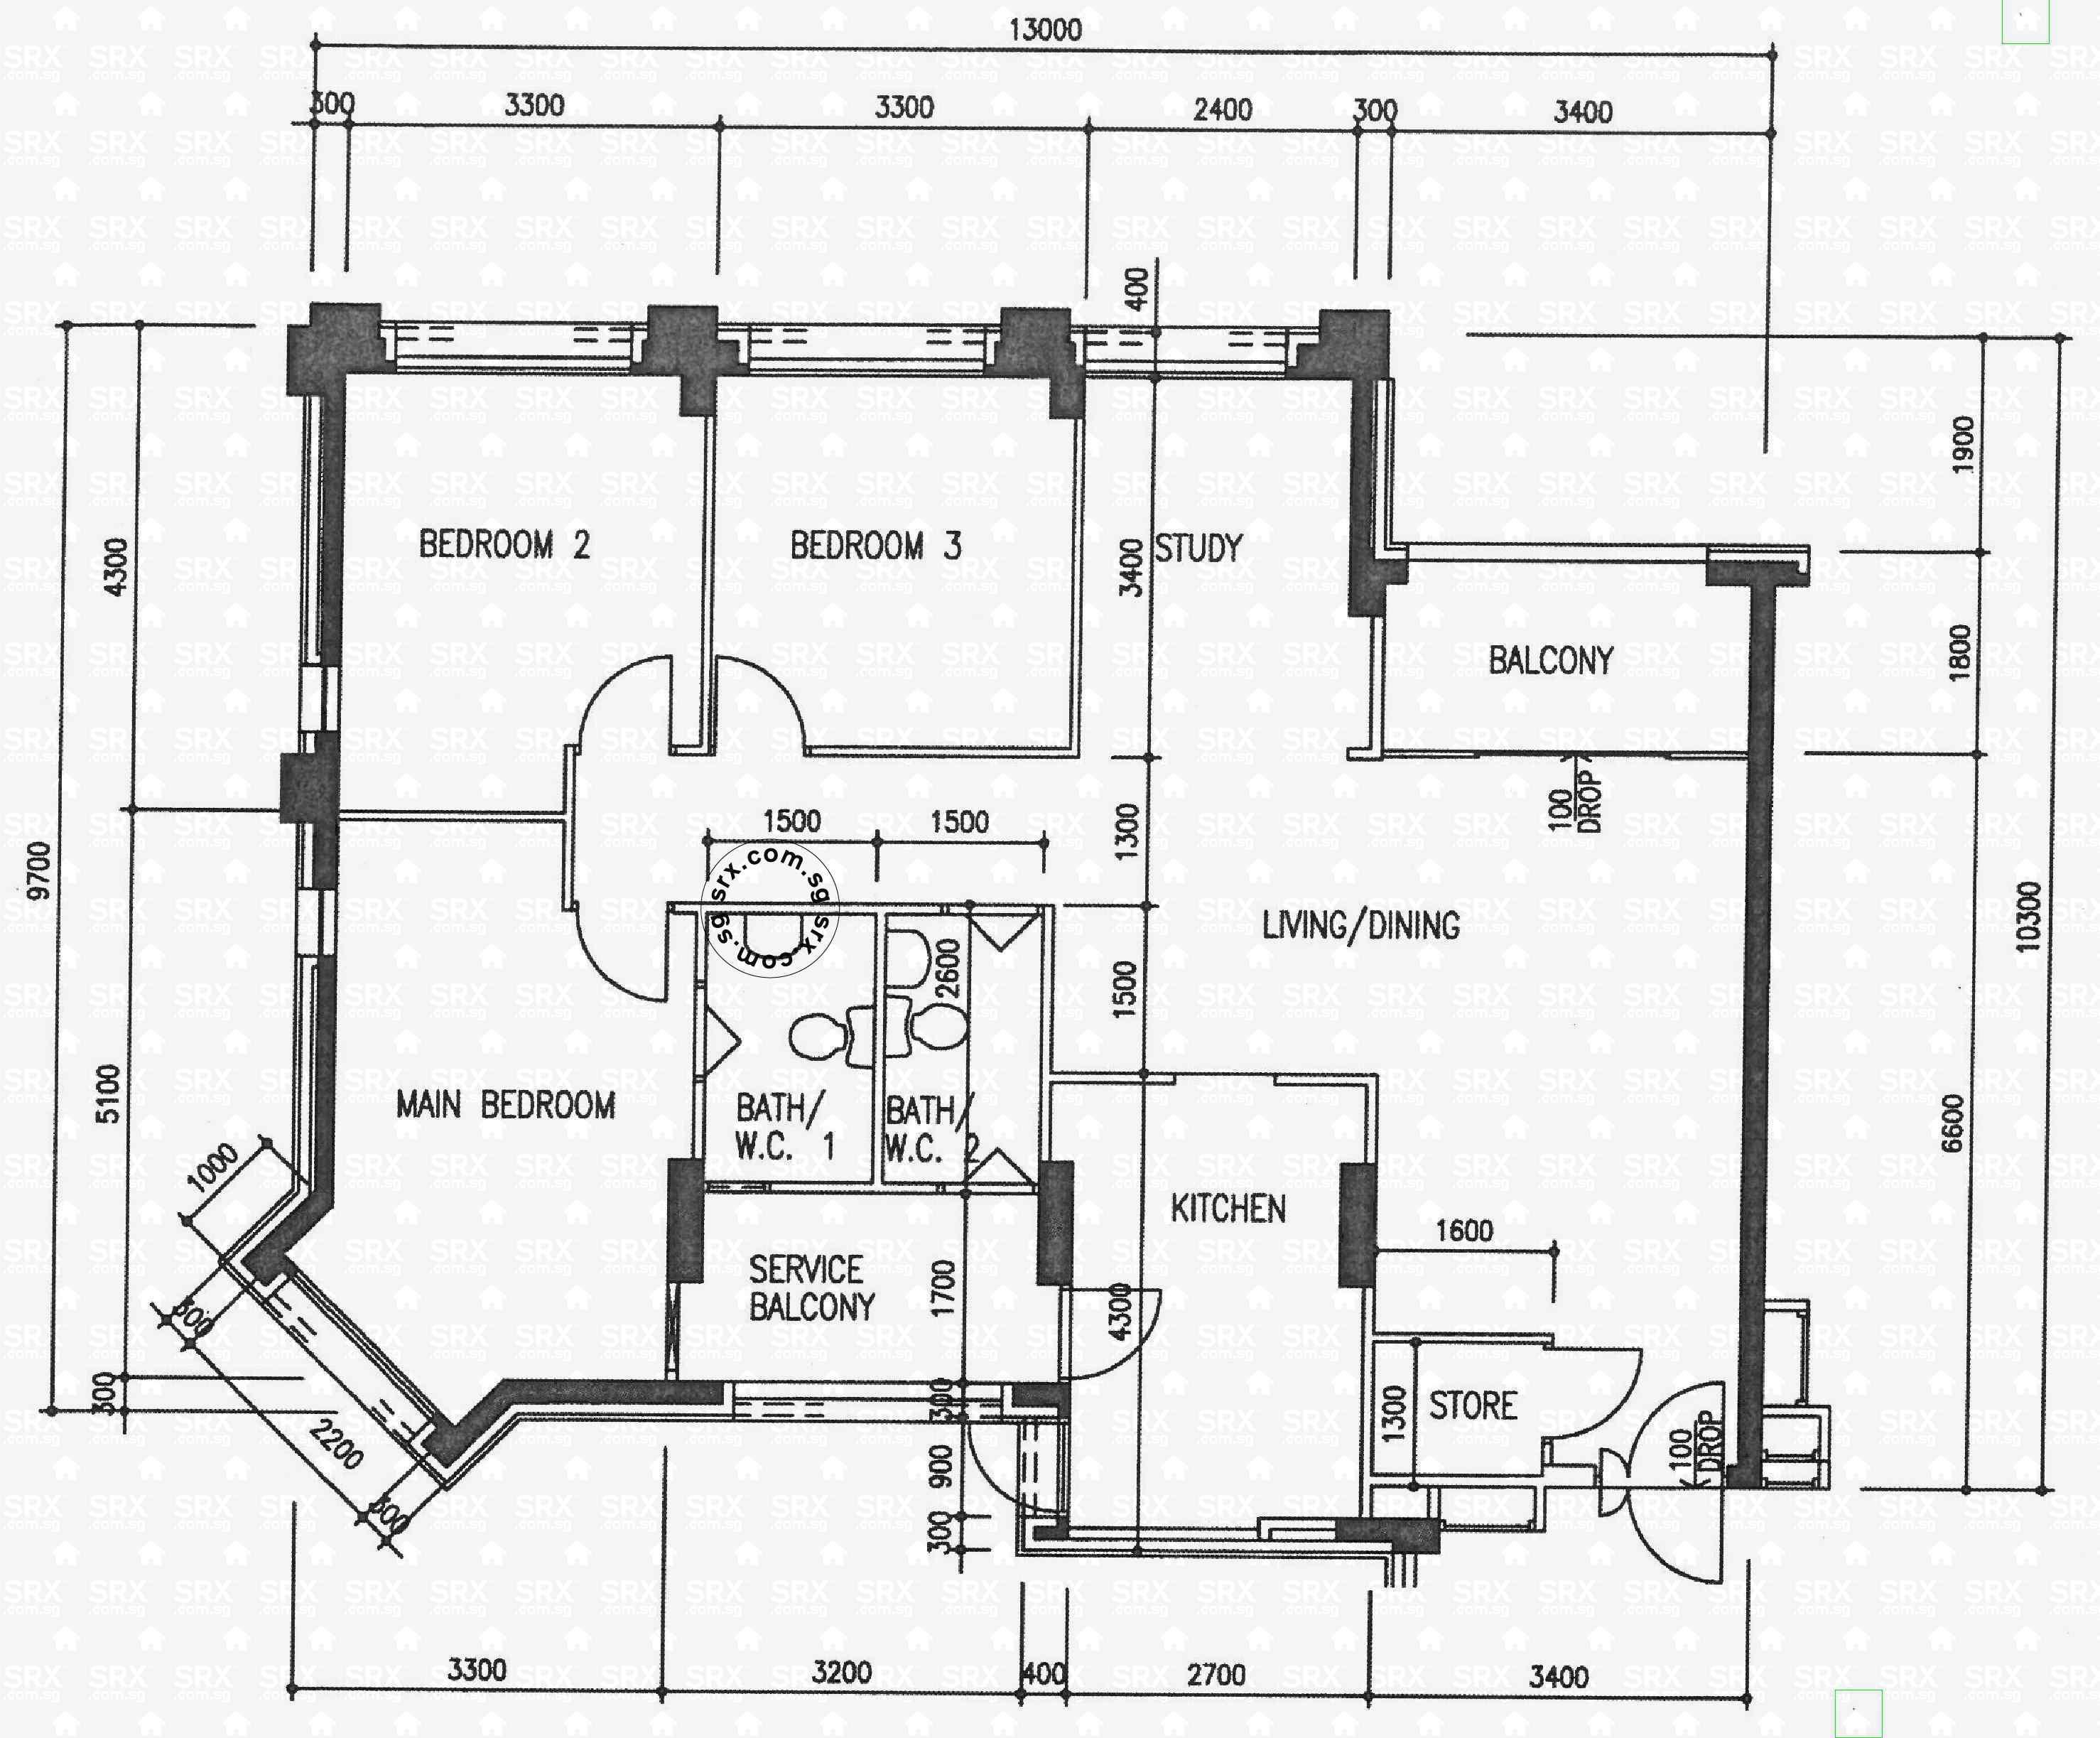 woodlands avenue  (s) hdb details  srx property - blk  woodlands avenue  (s) floor plan image